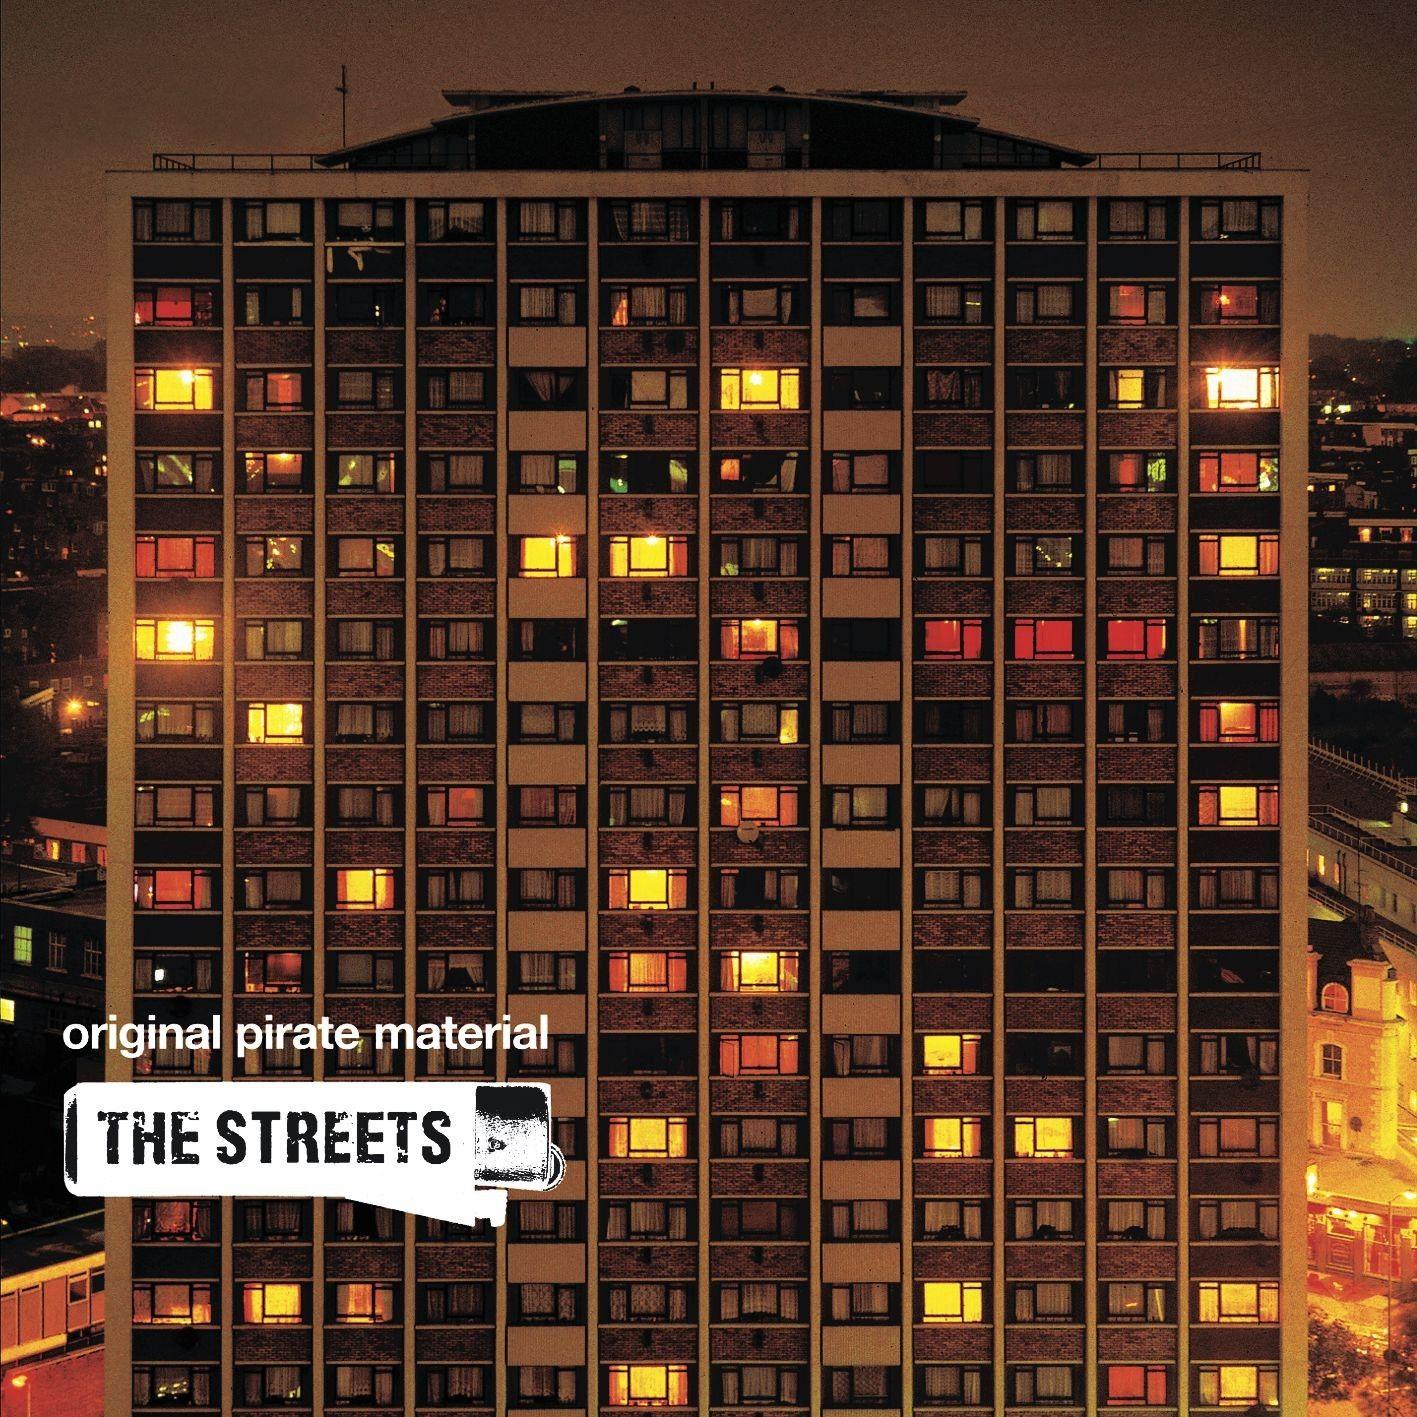 Streets - Original Pirate Material album cover